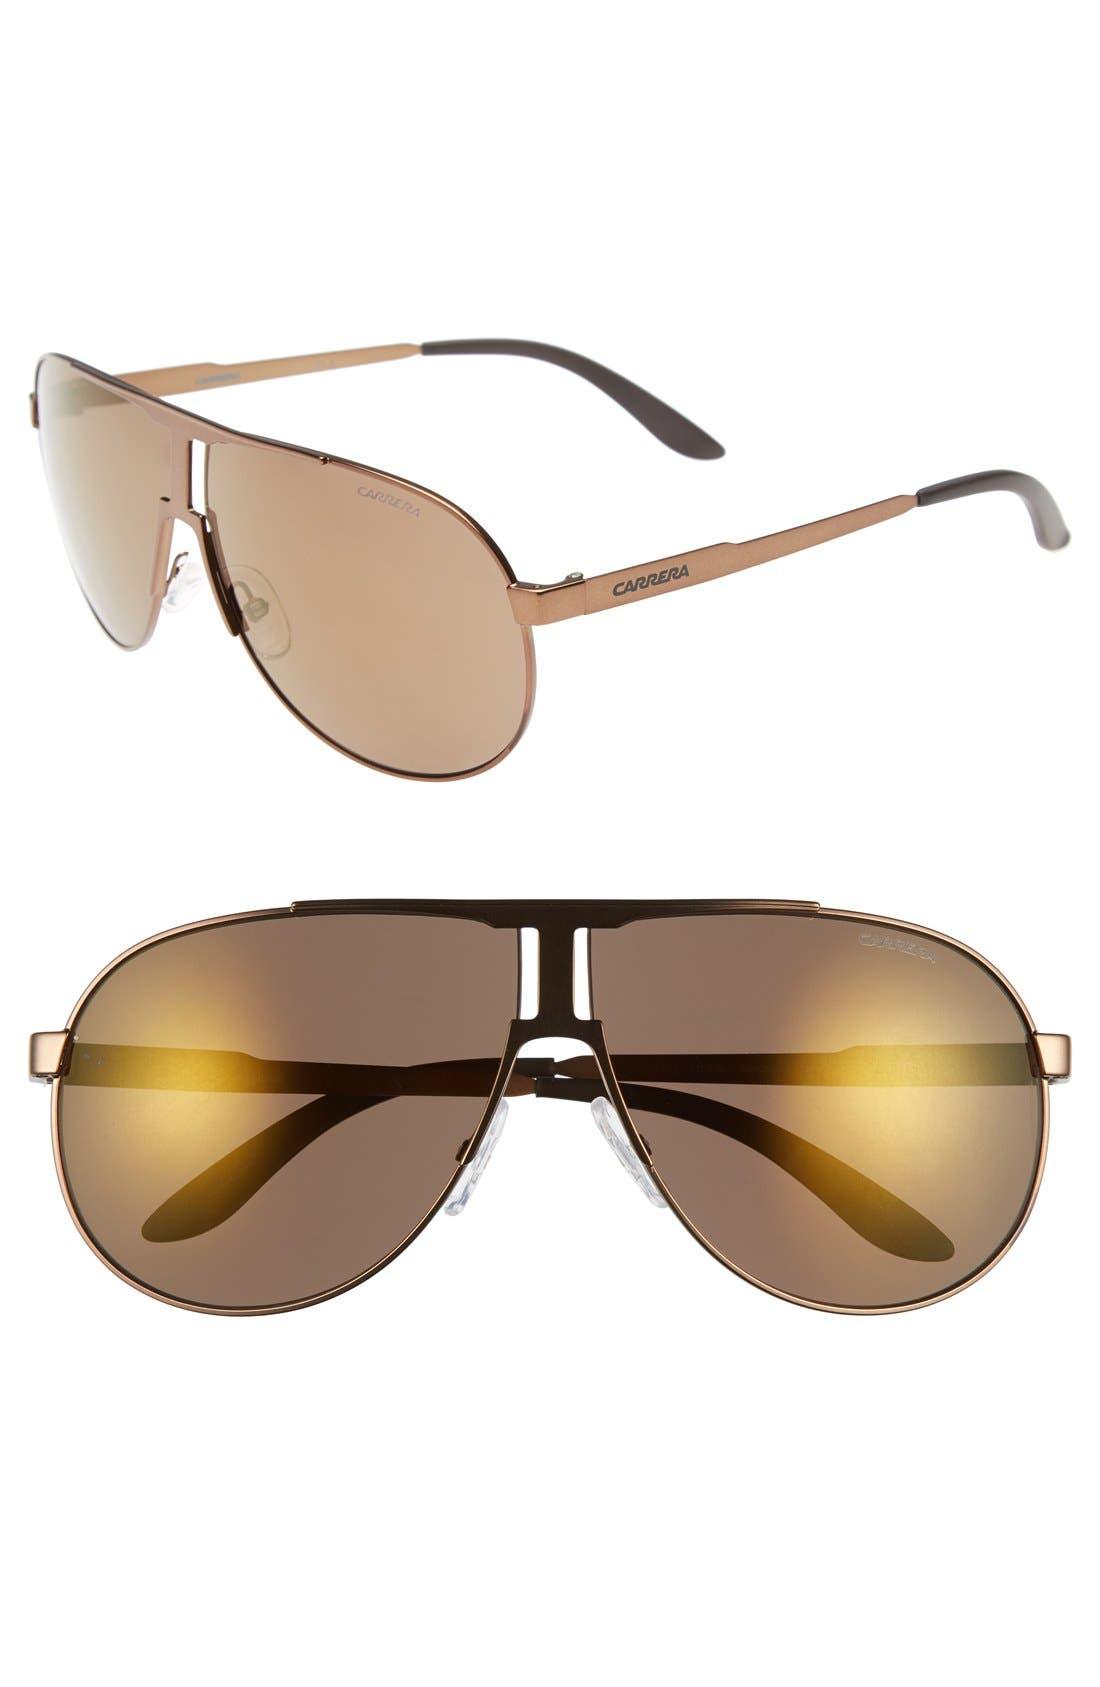 64mm Aviator Sunglasses,                             Main thumbnail 1, color,                             202